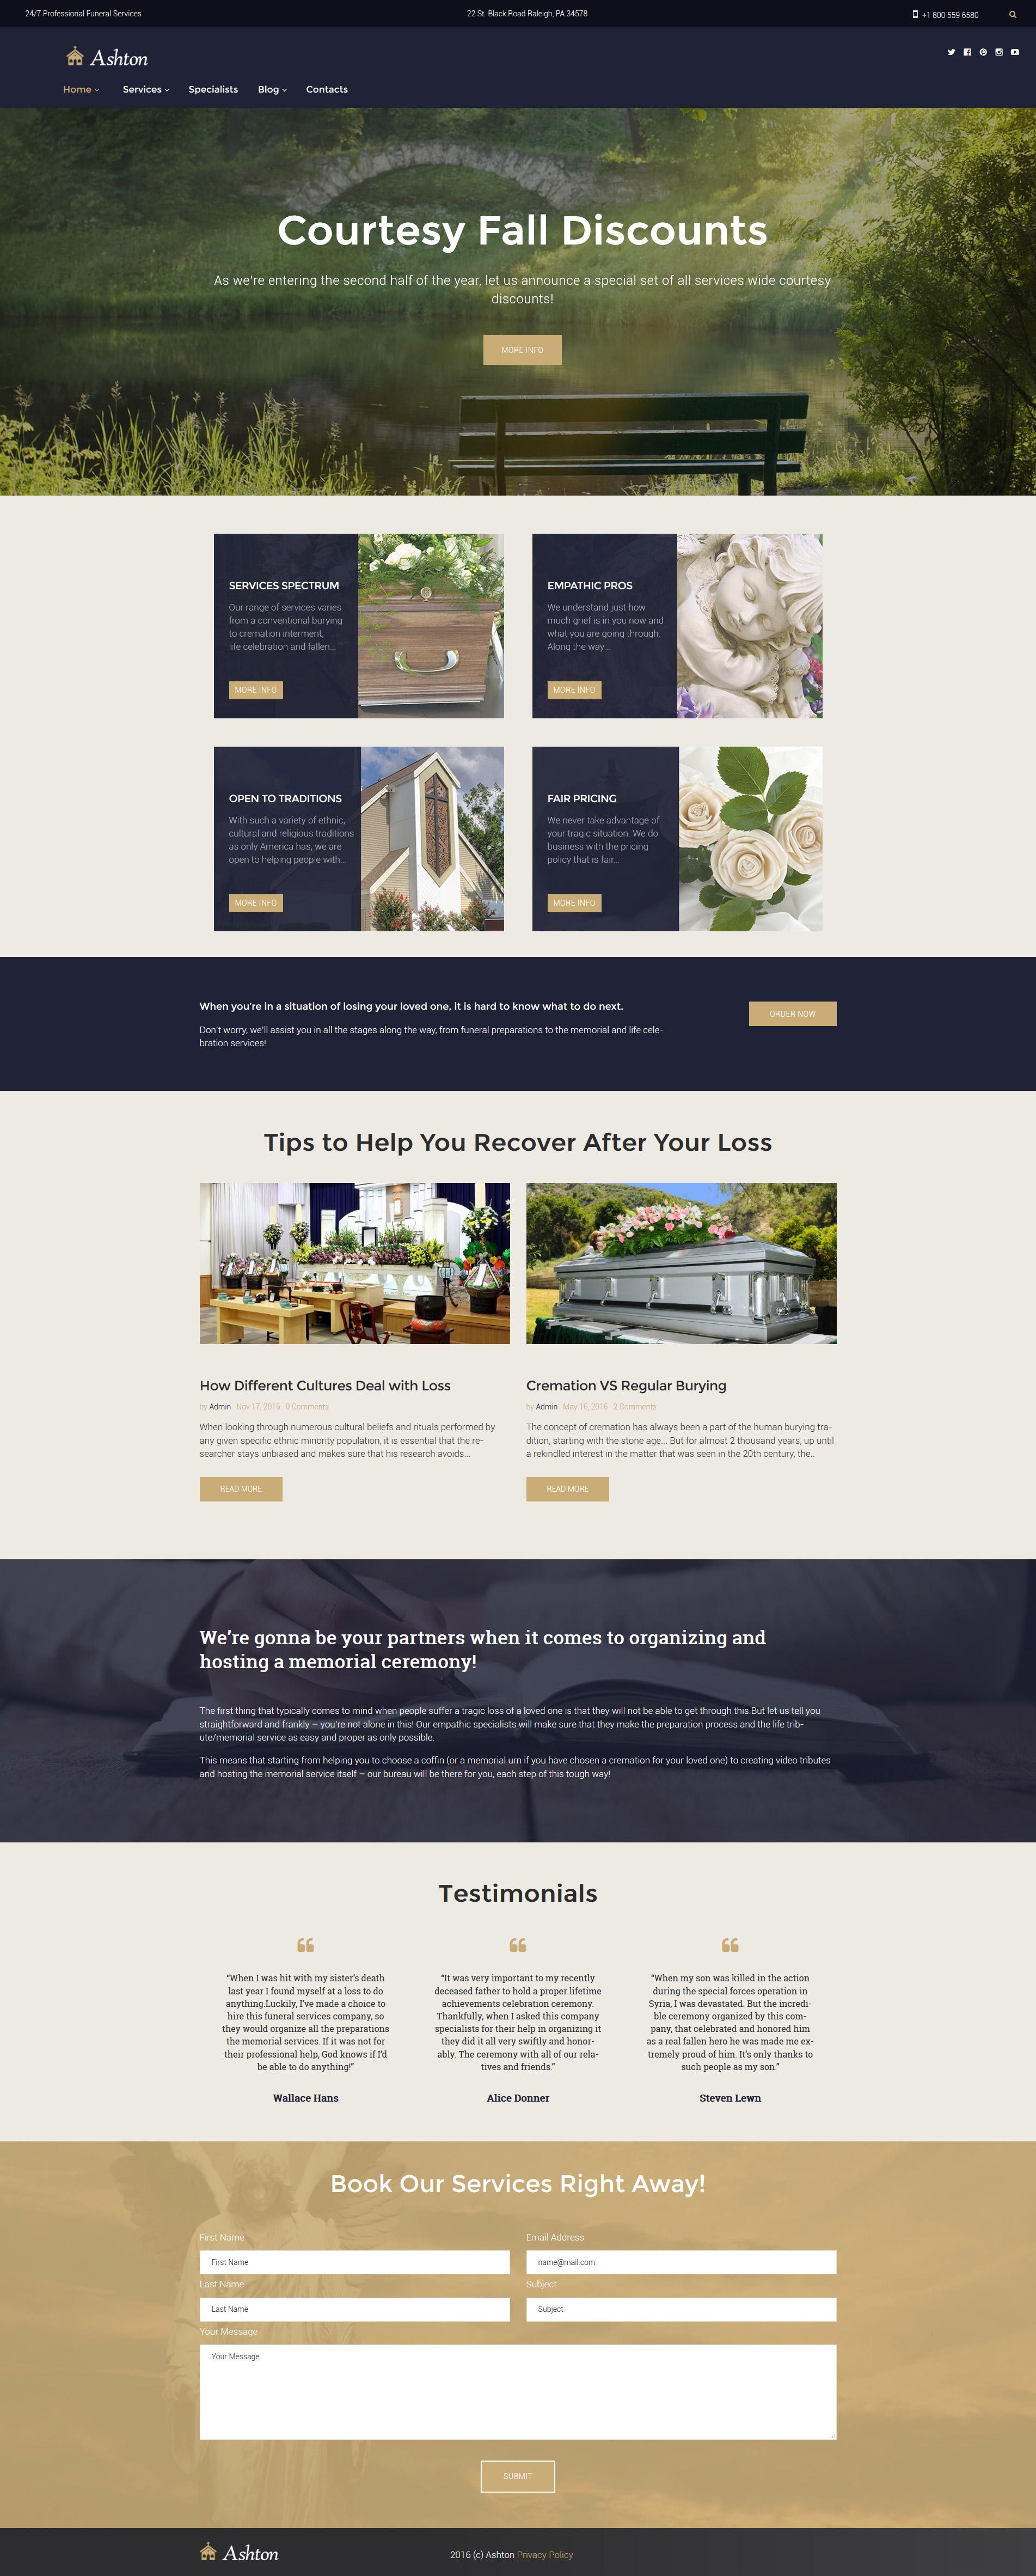 Ashton - Funeral & Cemetery Services WordPress Theme - screenshot